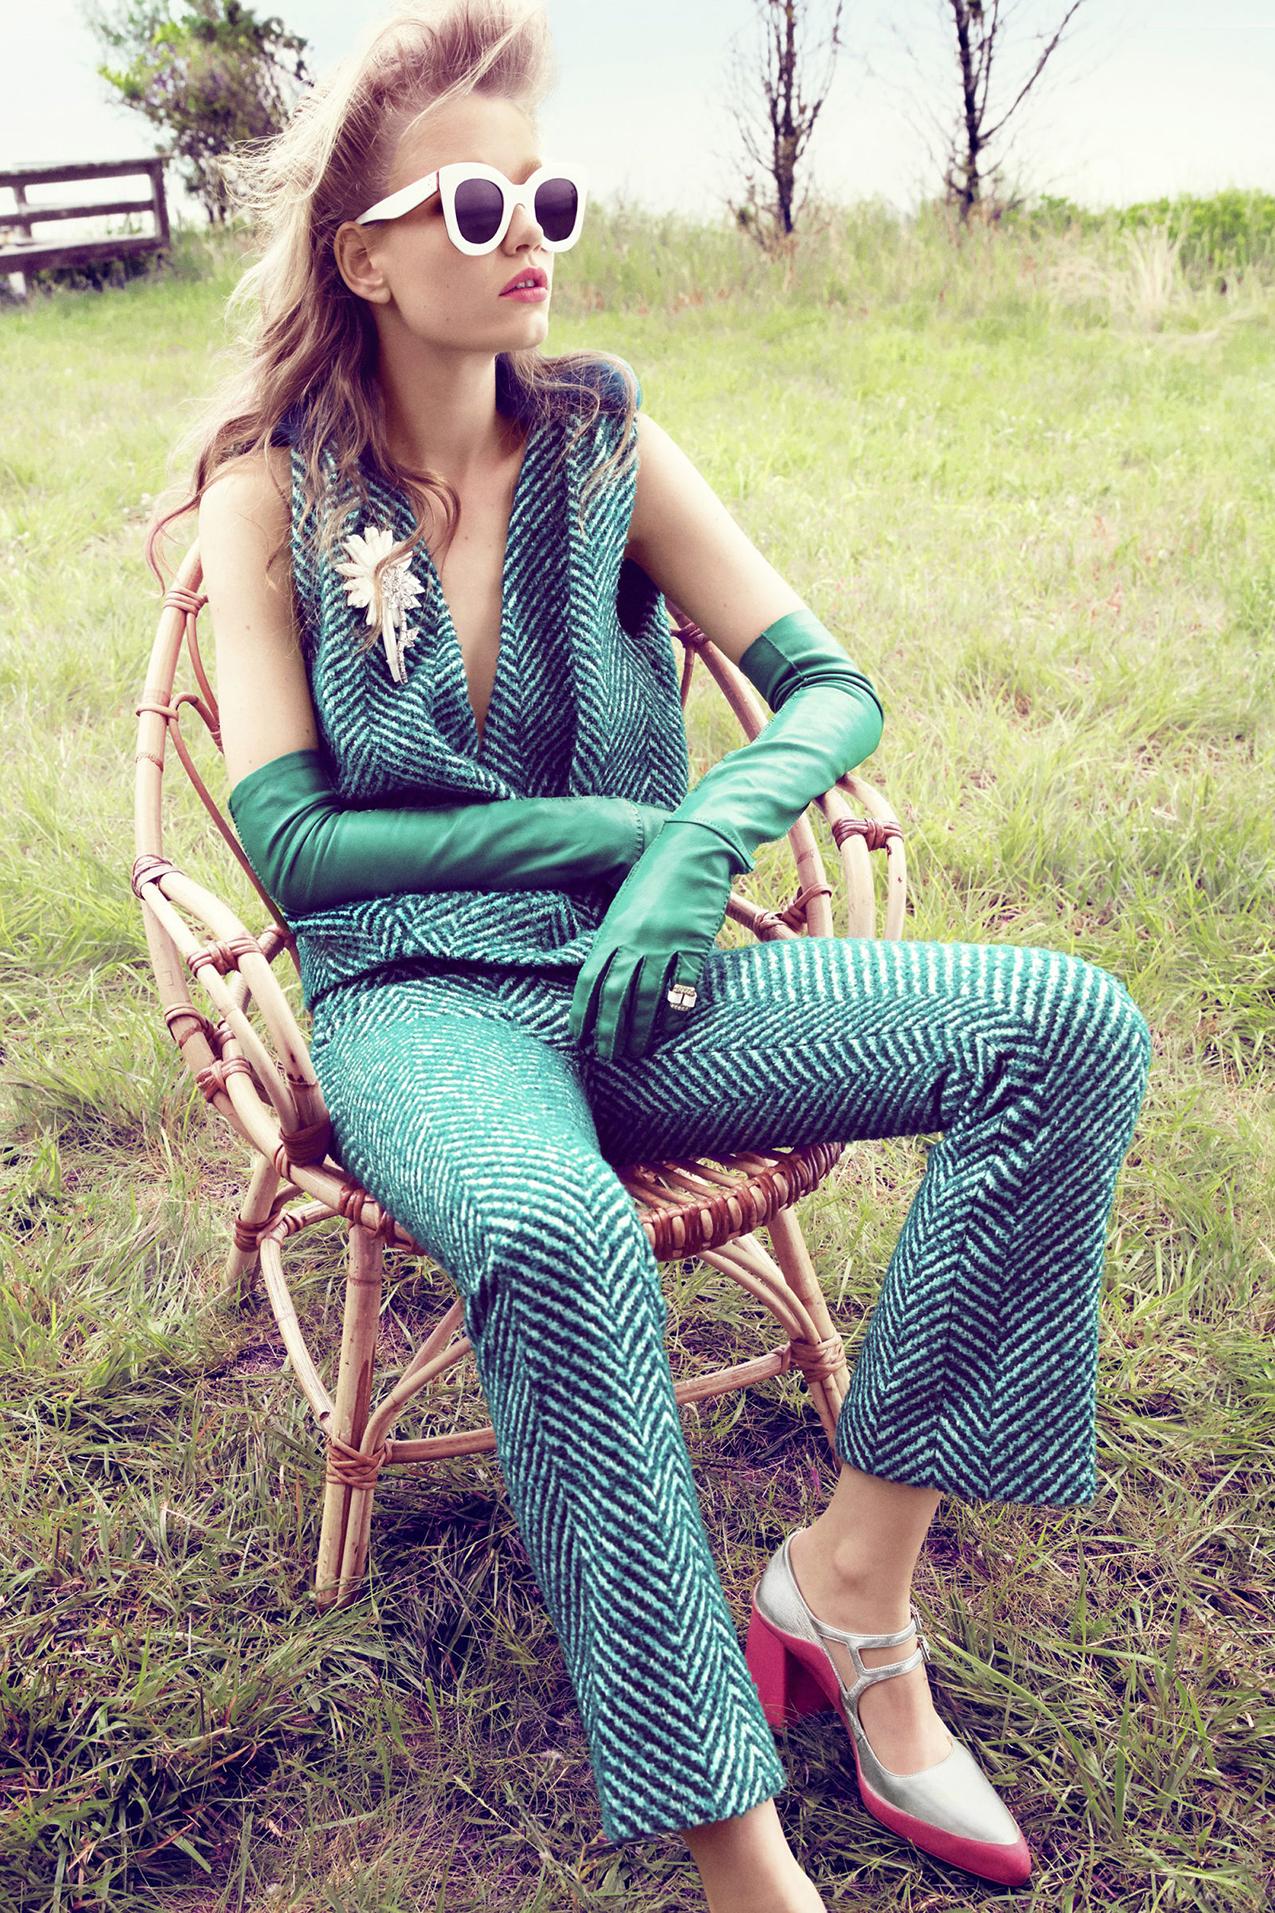 hbz-bright-fashion-october-2015-05.jpg